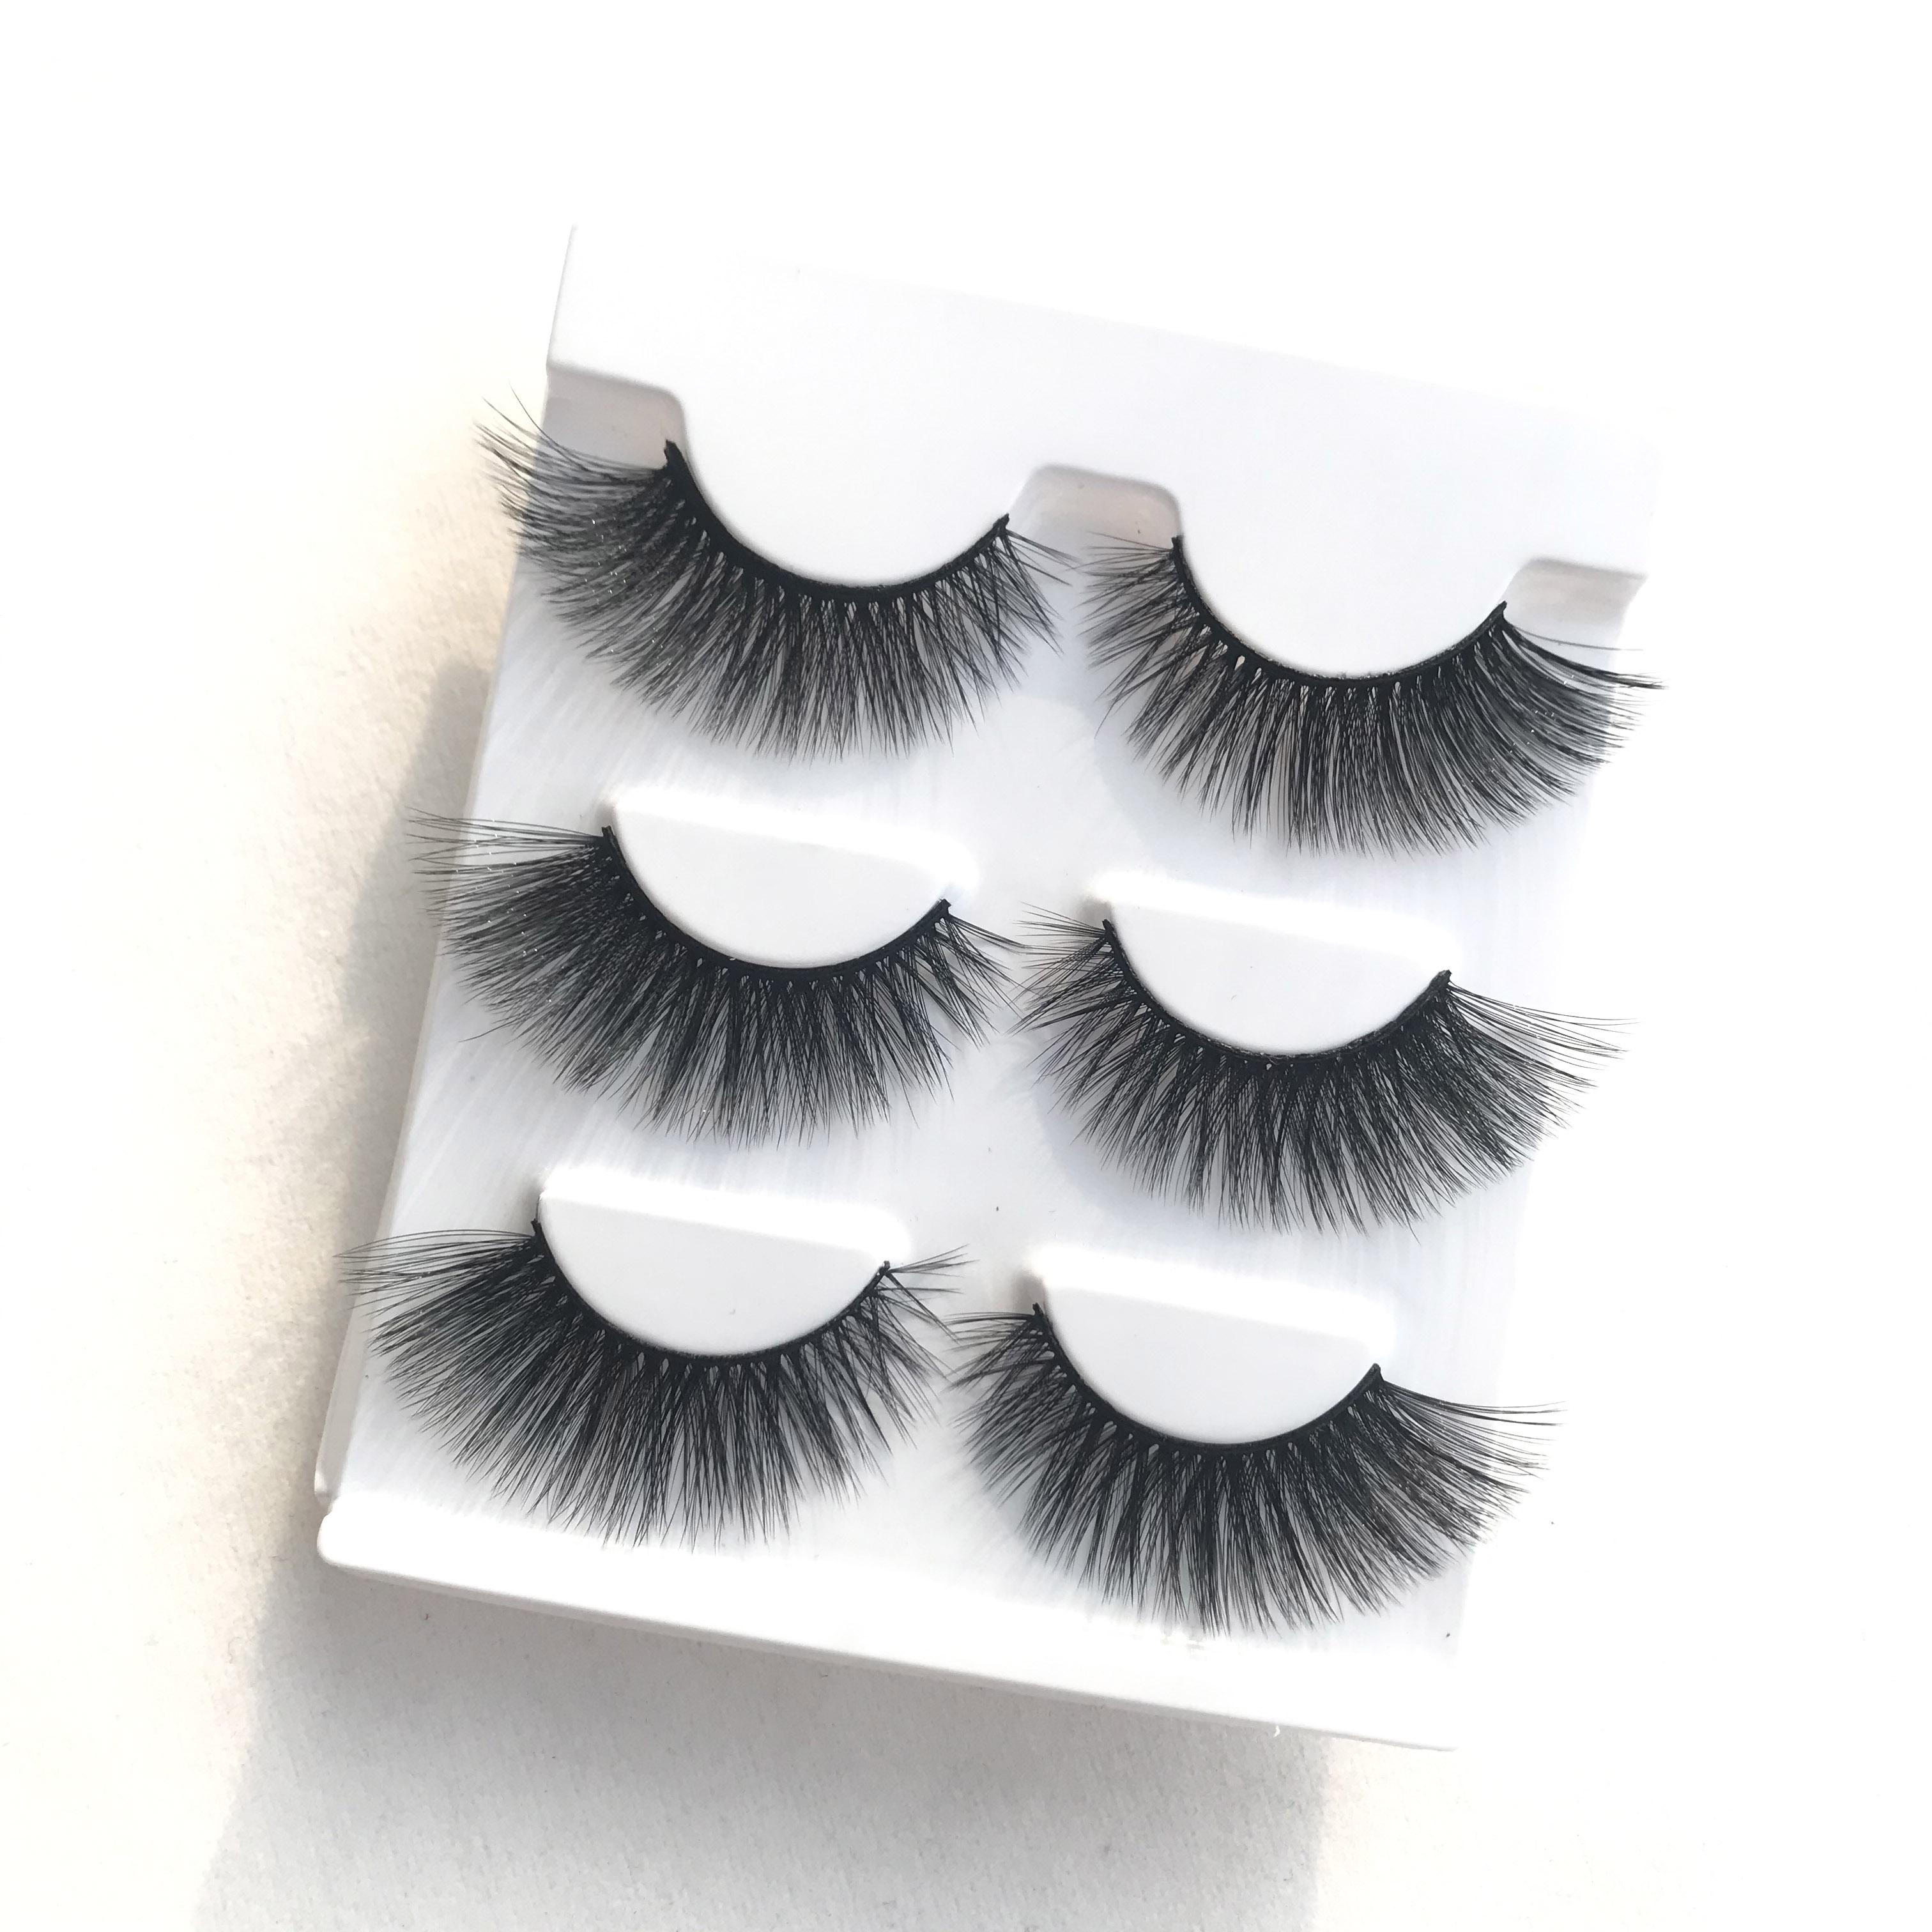 3 Pairs High Quality Silk False Eyelashes Thick Black Messy 3D Eye Lashes Art Performance Makeup Fak